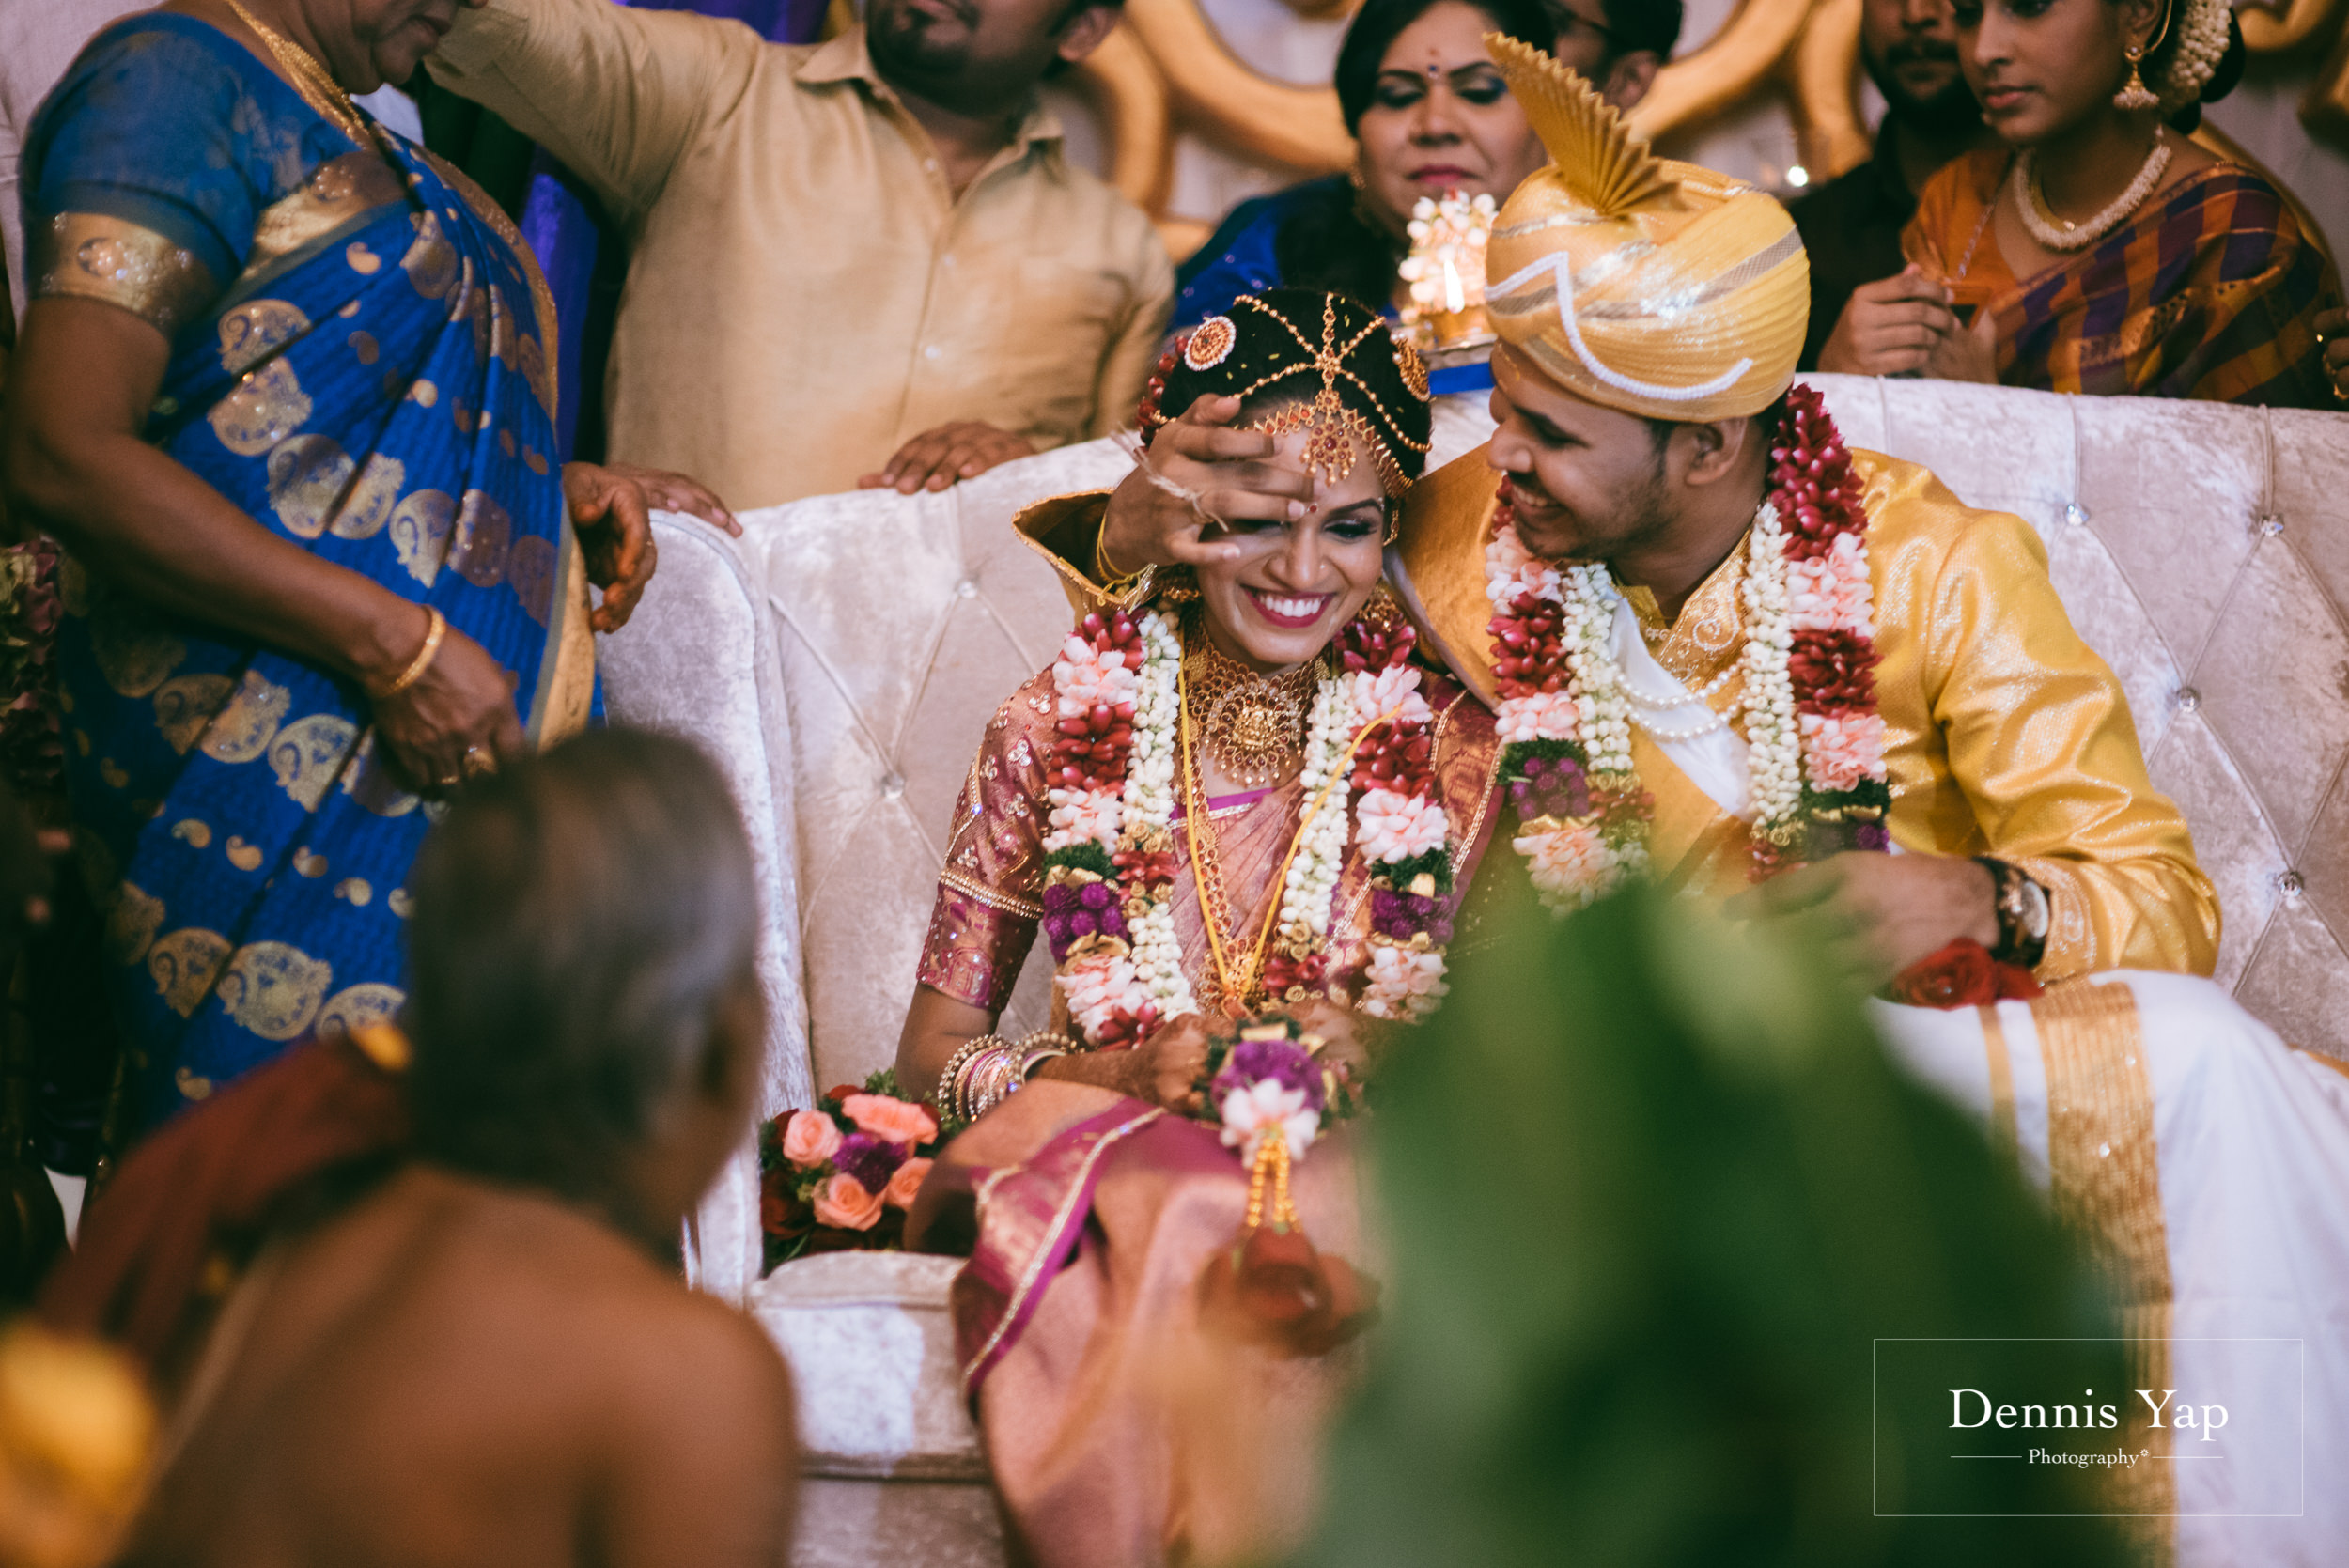 puvaneswaran cangitaa indian wedding ceremony ideal convention dennis yap photography malaysia-24.jpg